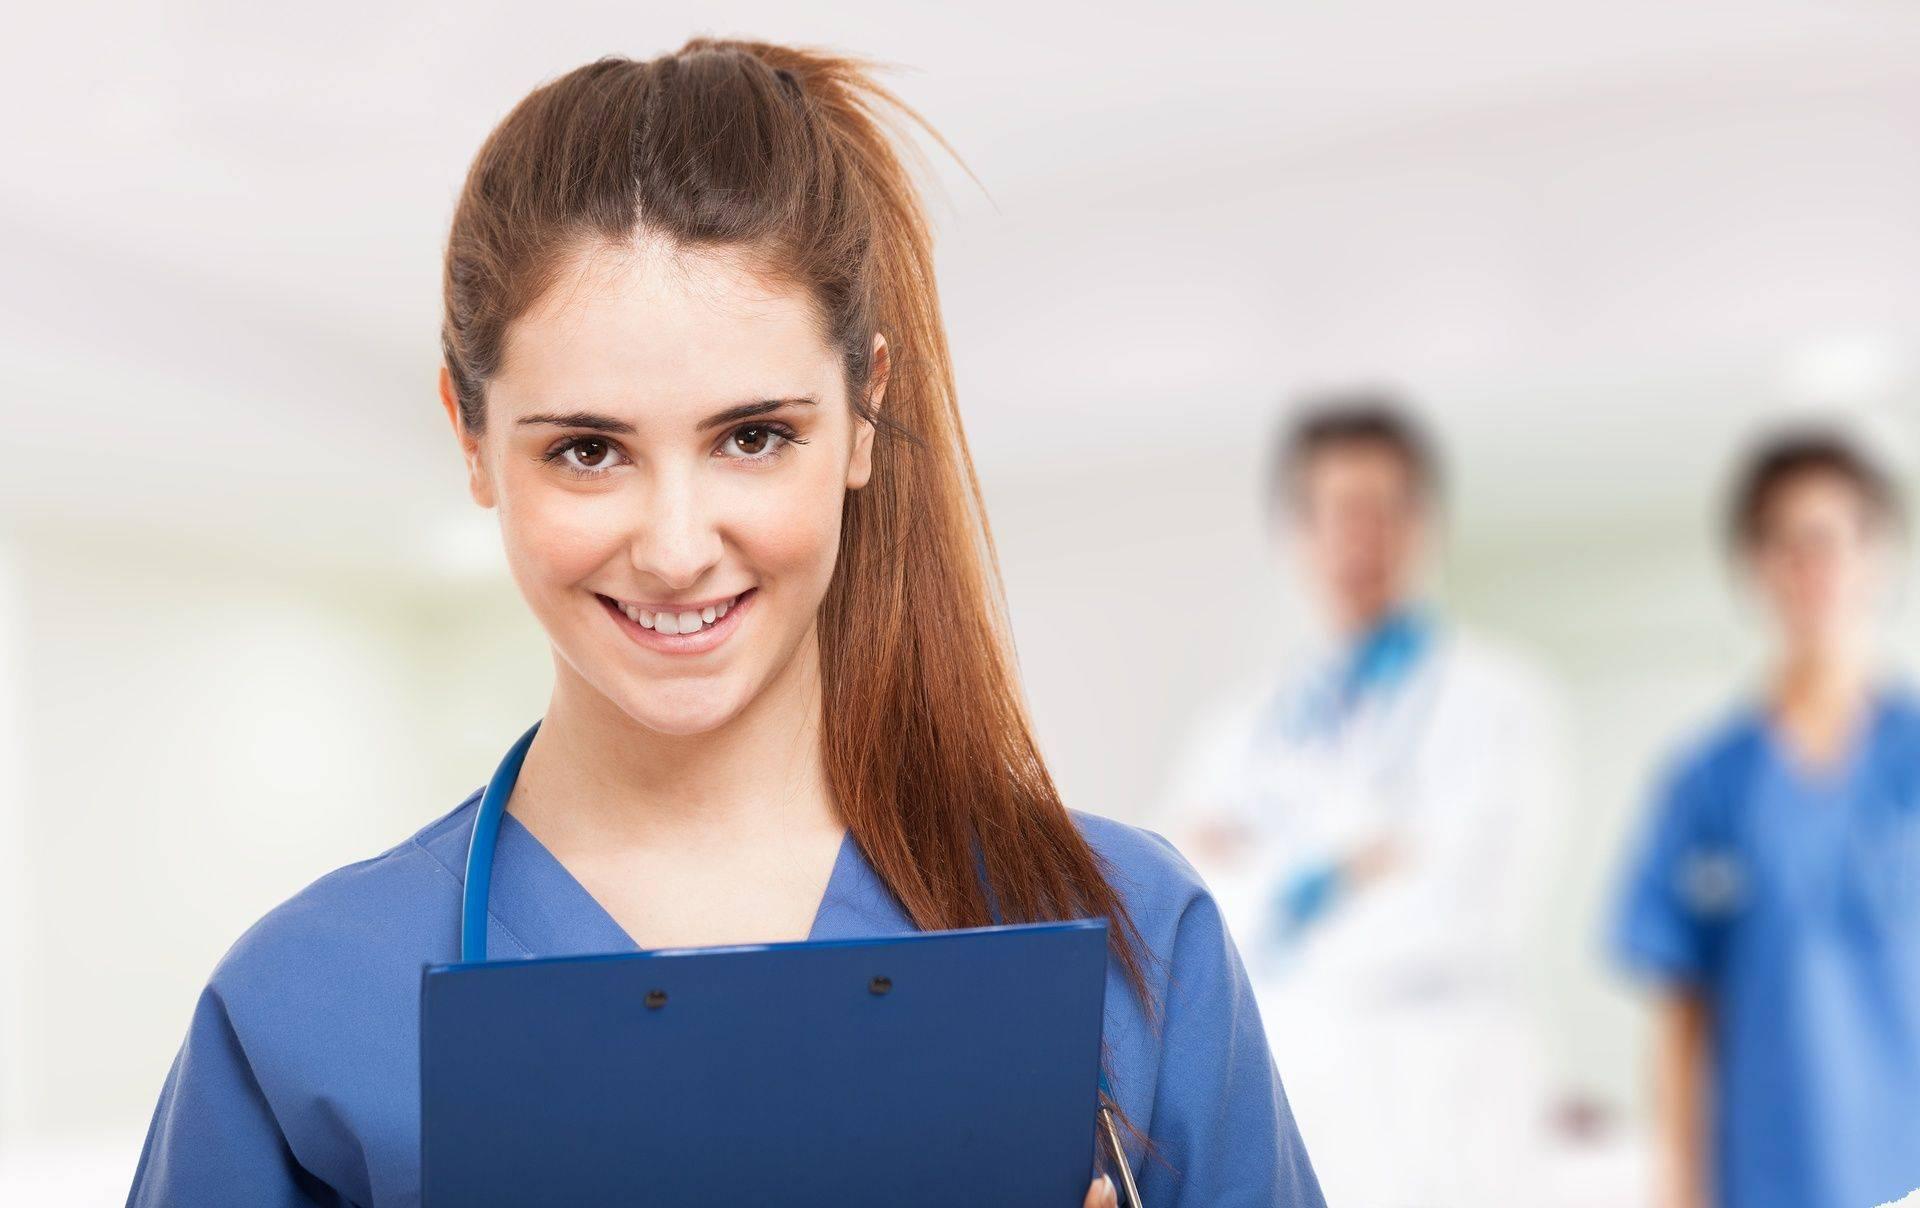 Majen now offers a Certified Nursing Assistant program!